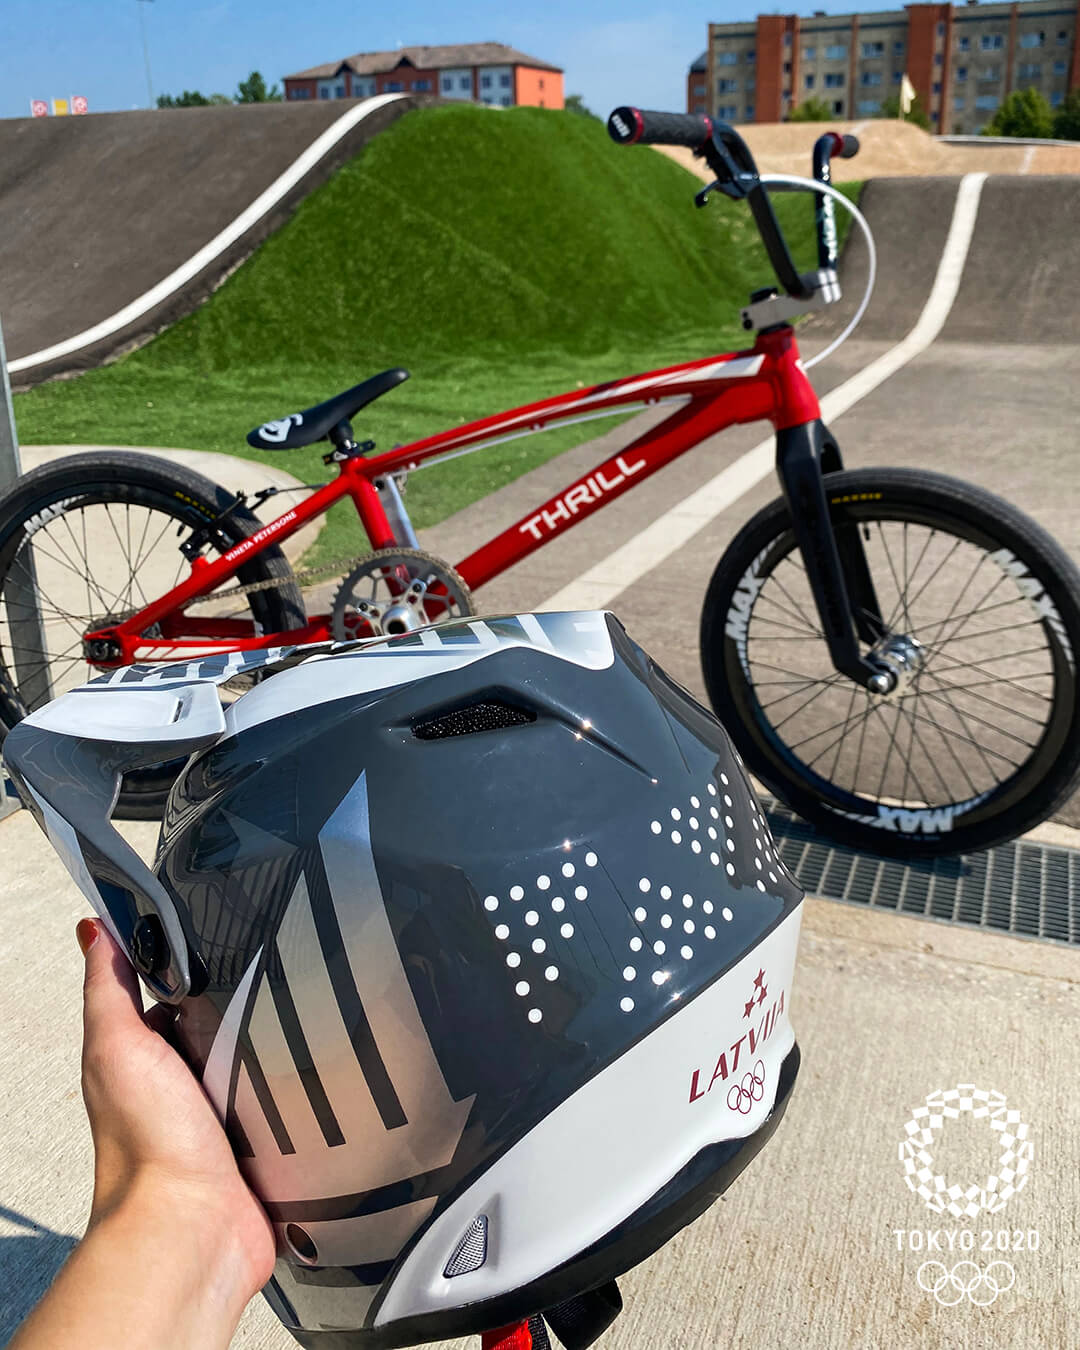 Vineta Petersone Tokyo 2020 Olympic Bike Check